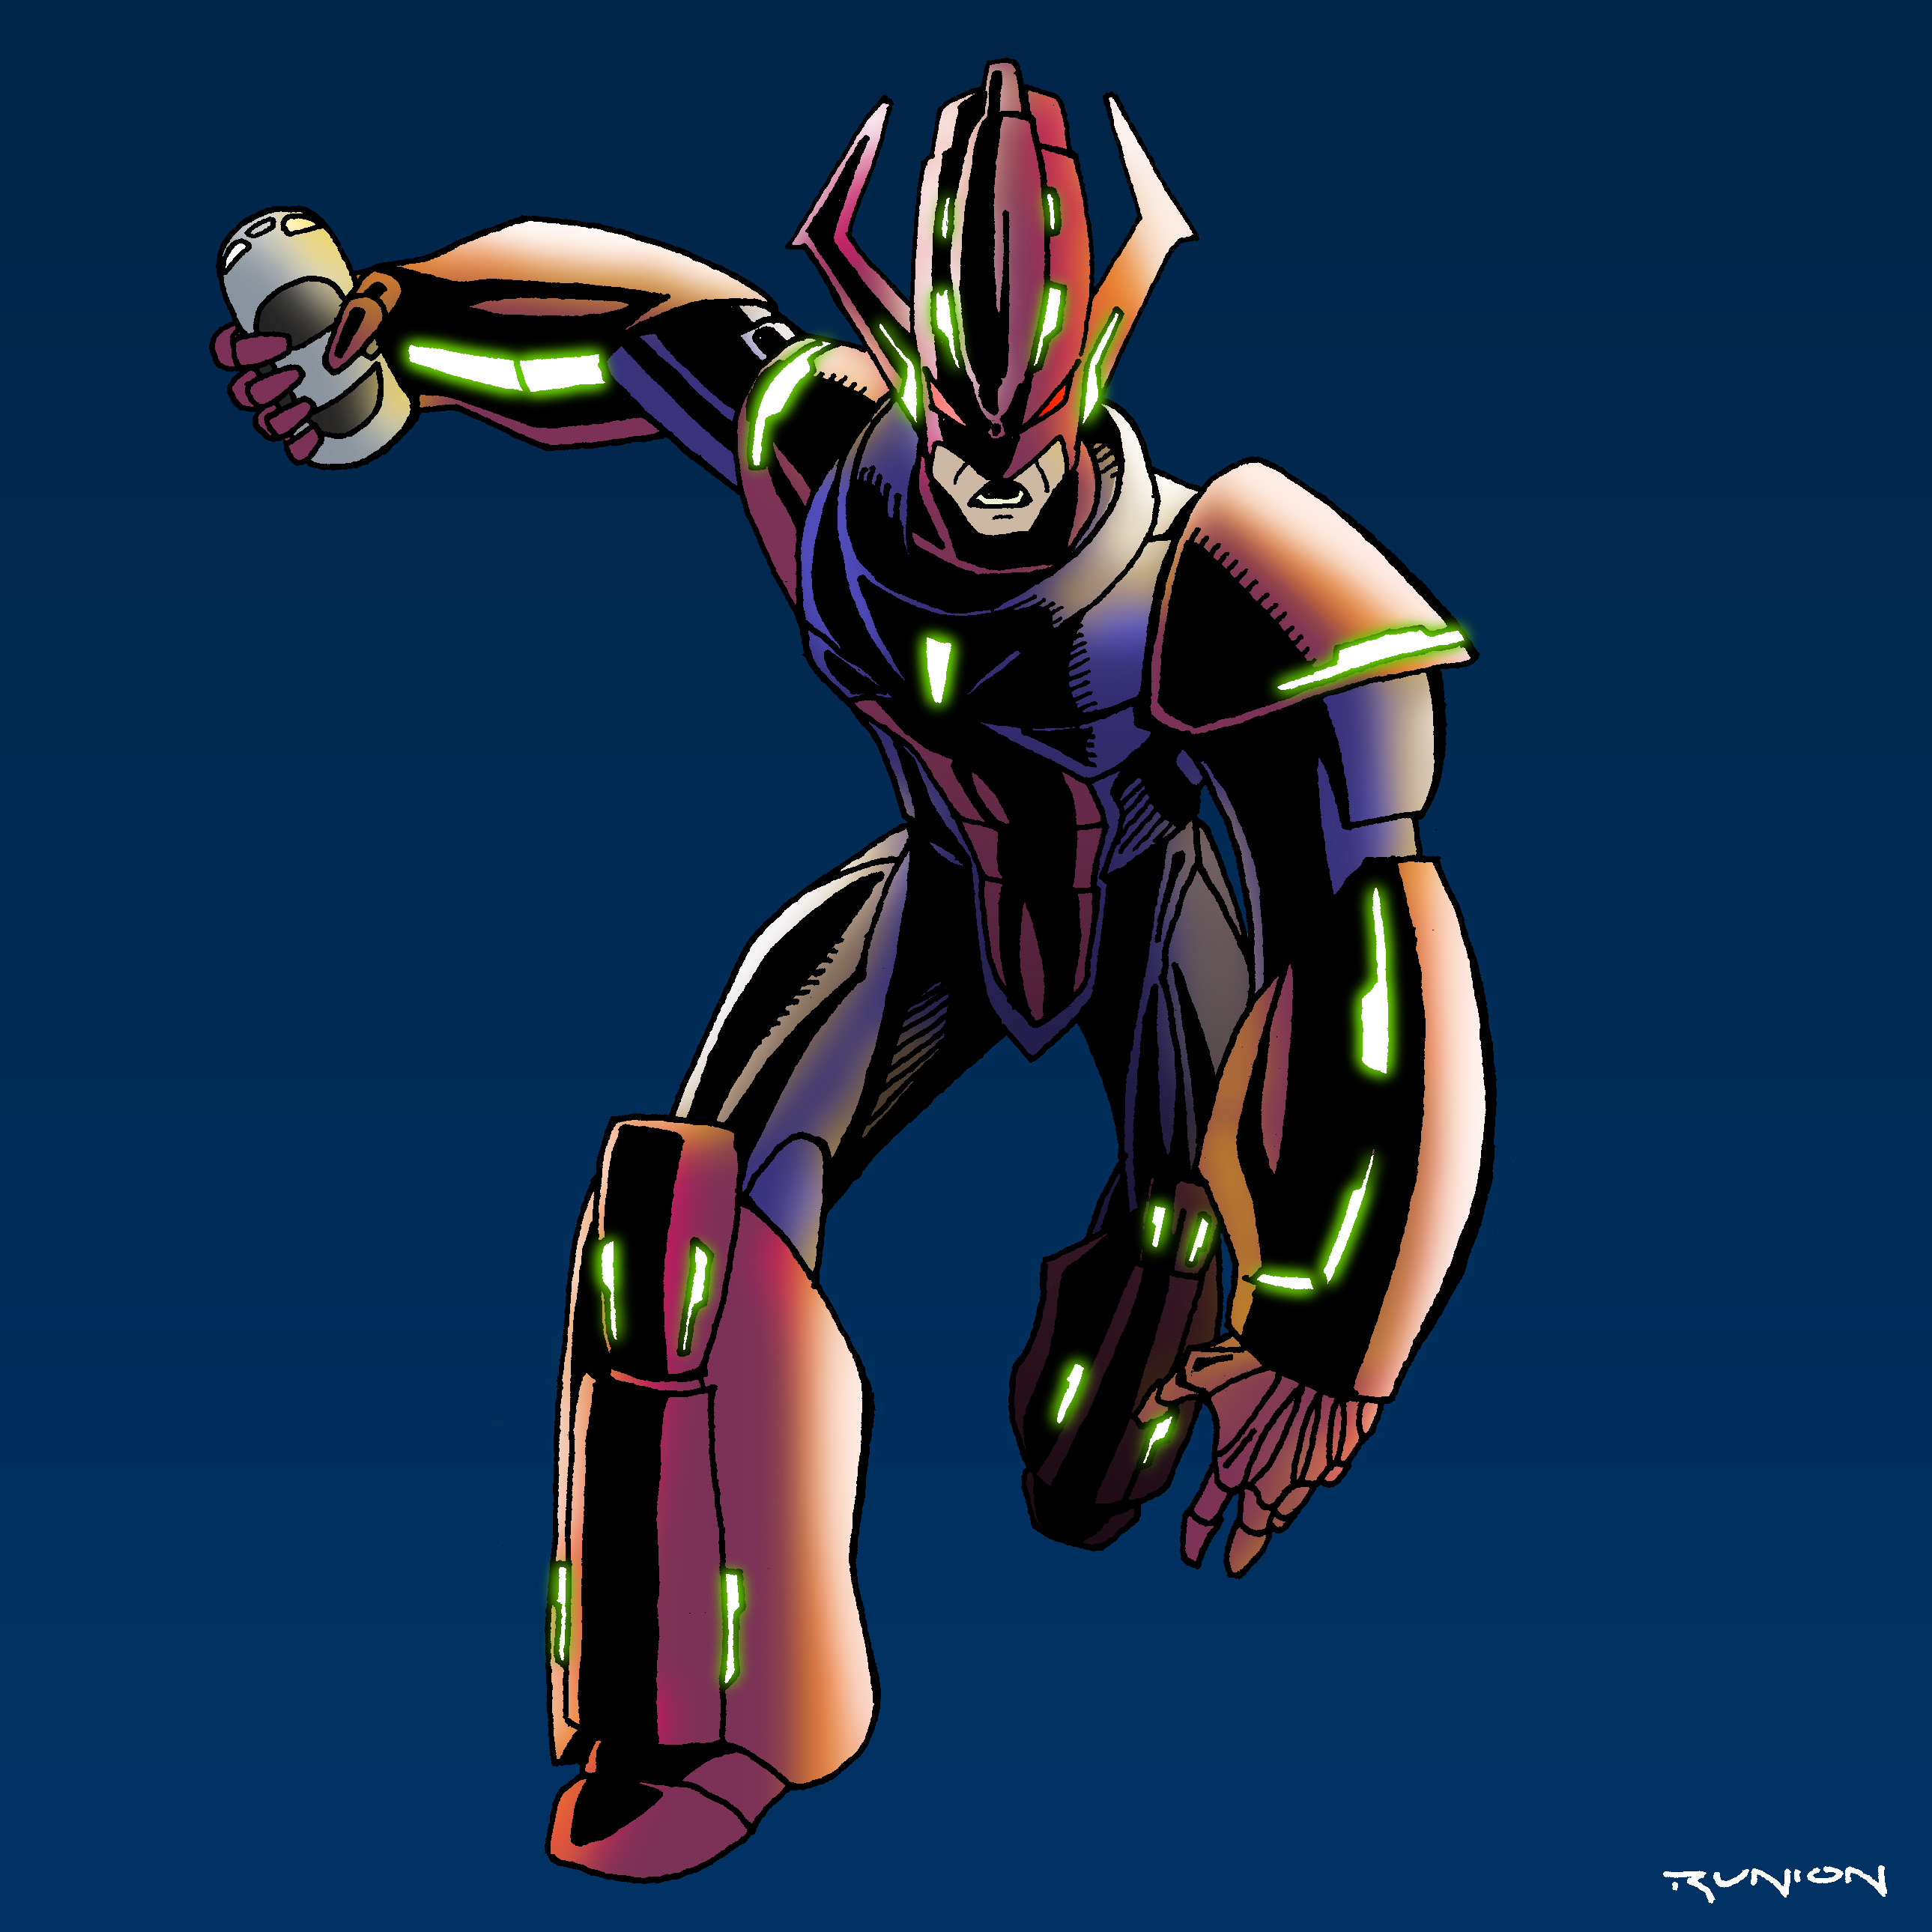 Galactus by arunion